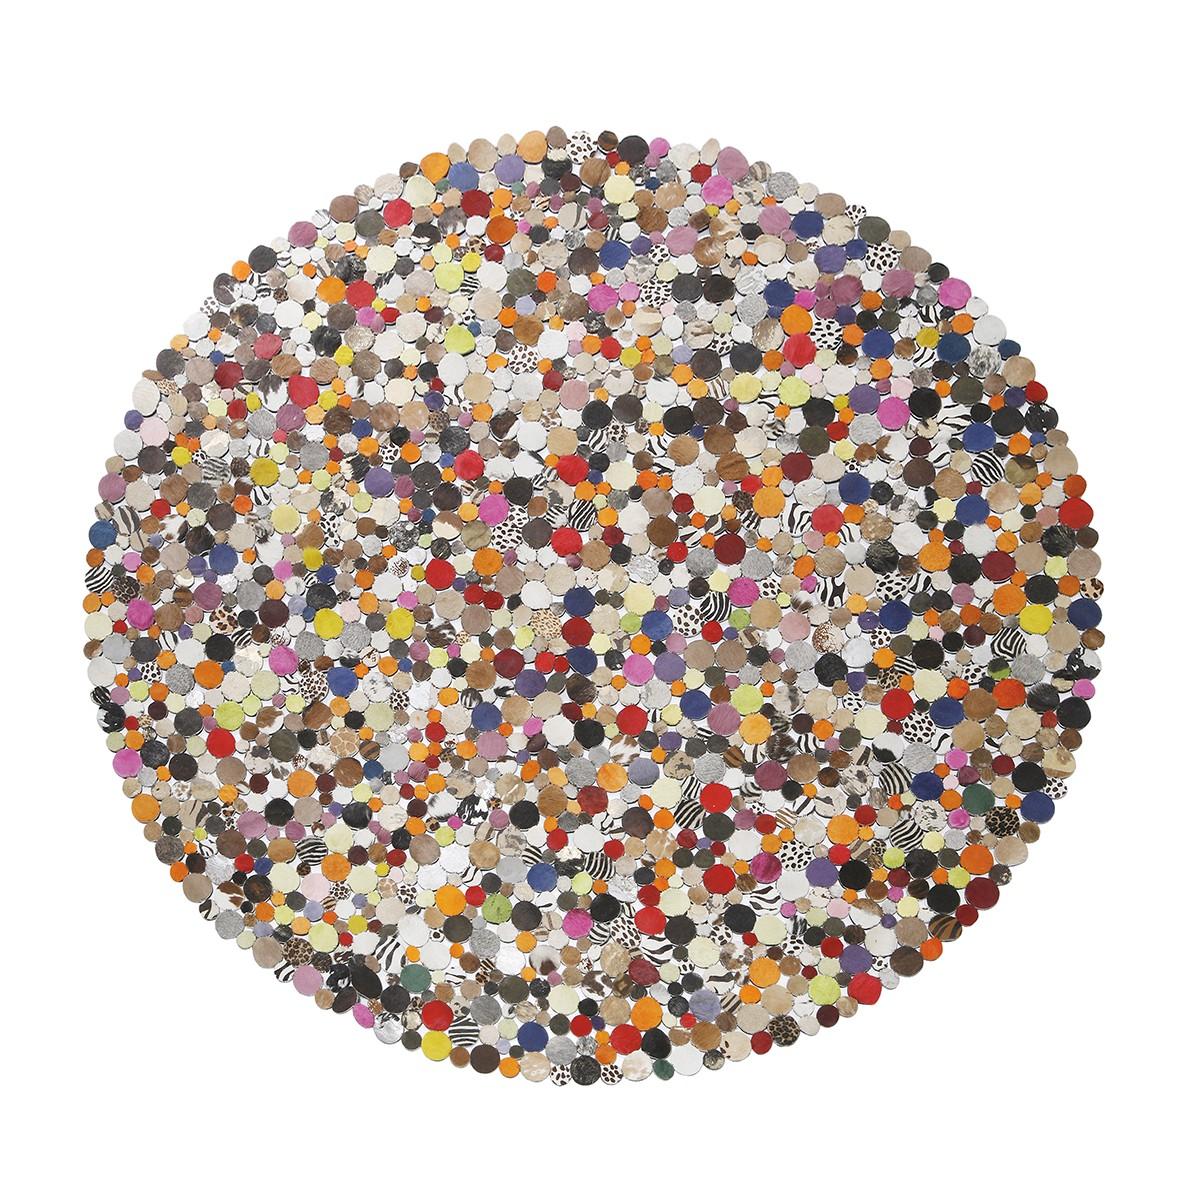 Tapijt Circle Multi - rundsleer/meerkleurig - 150cm, Kare Design